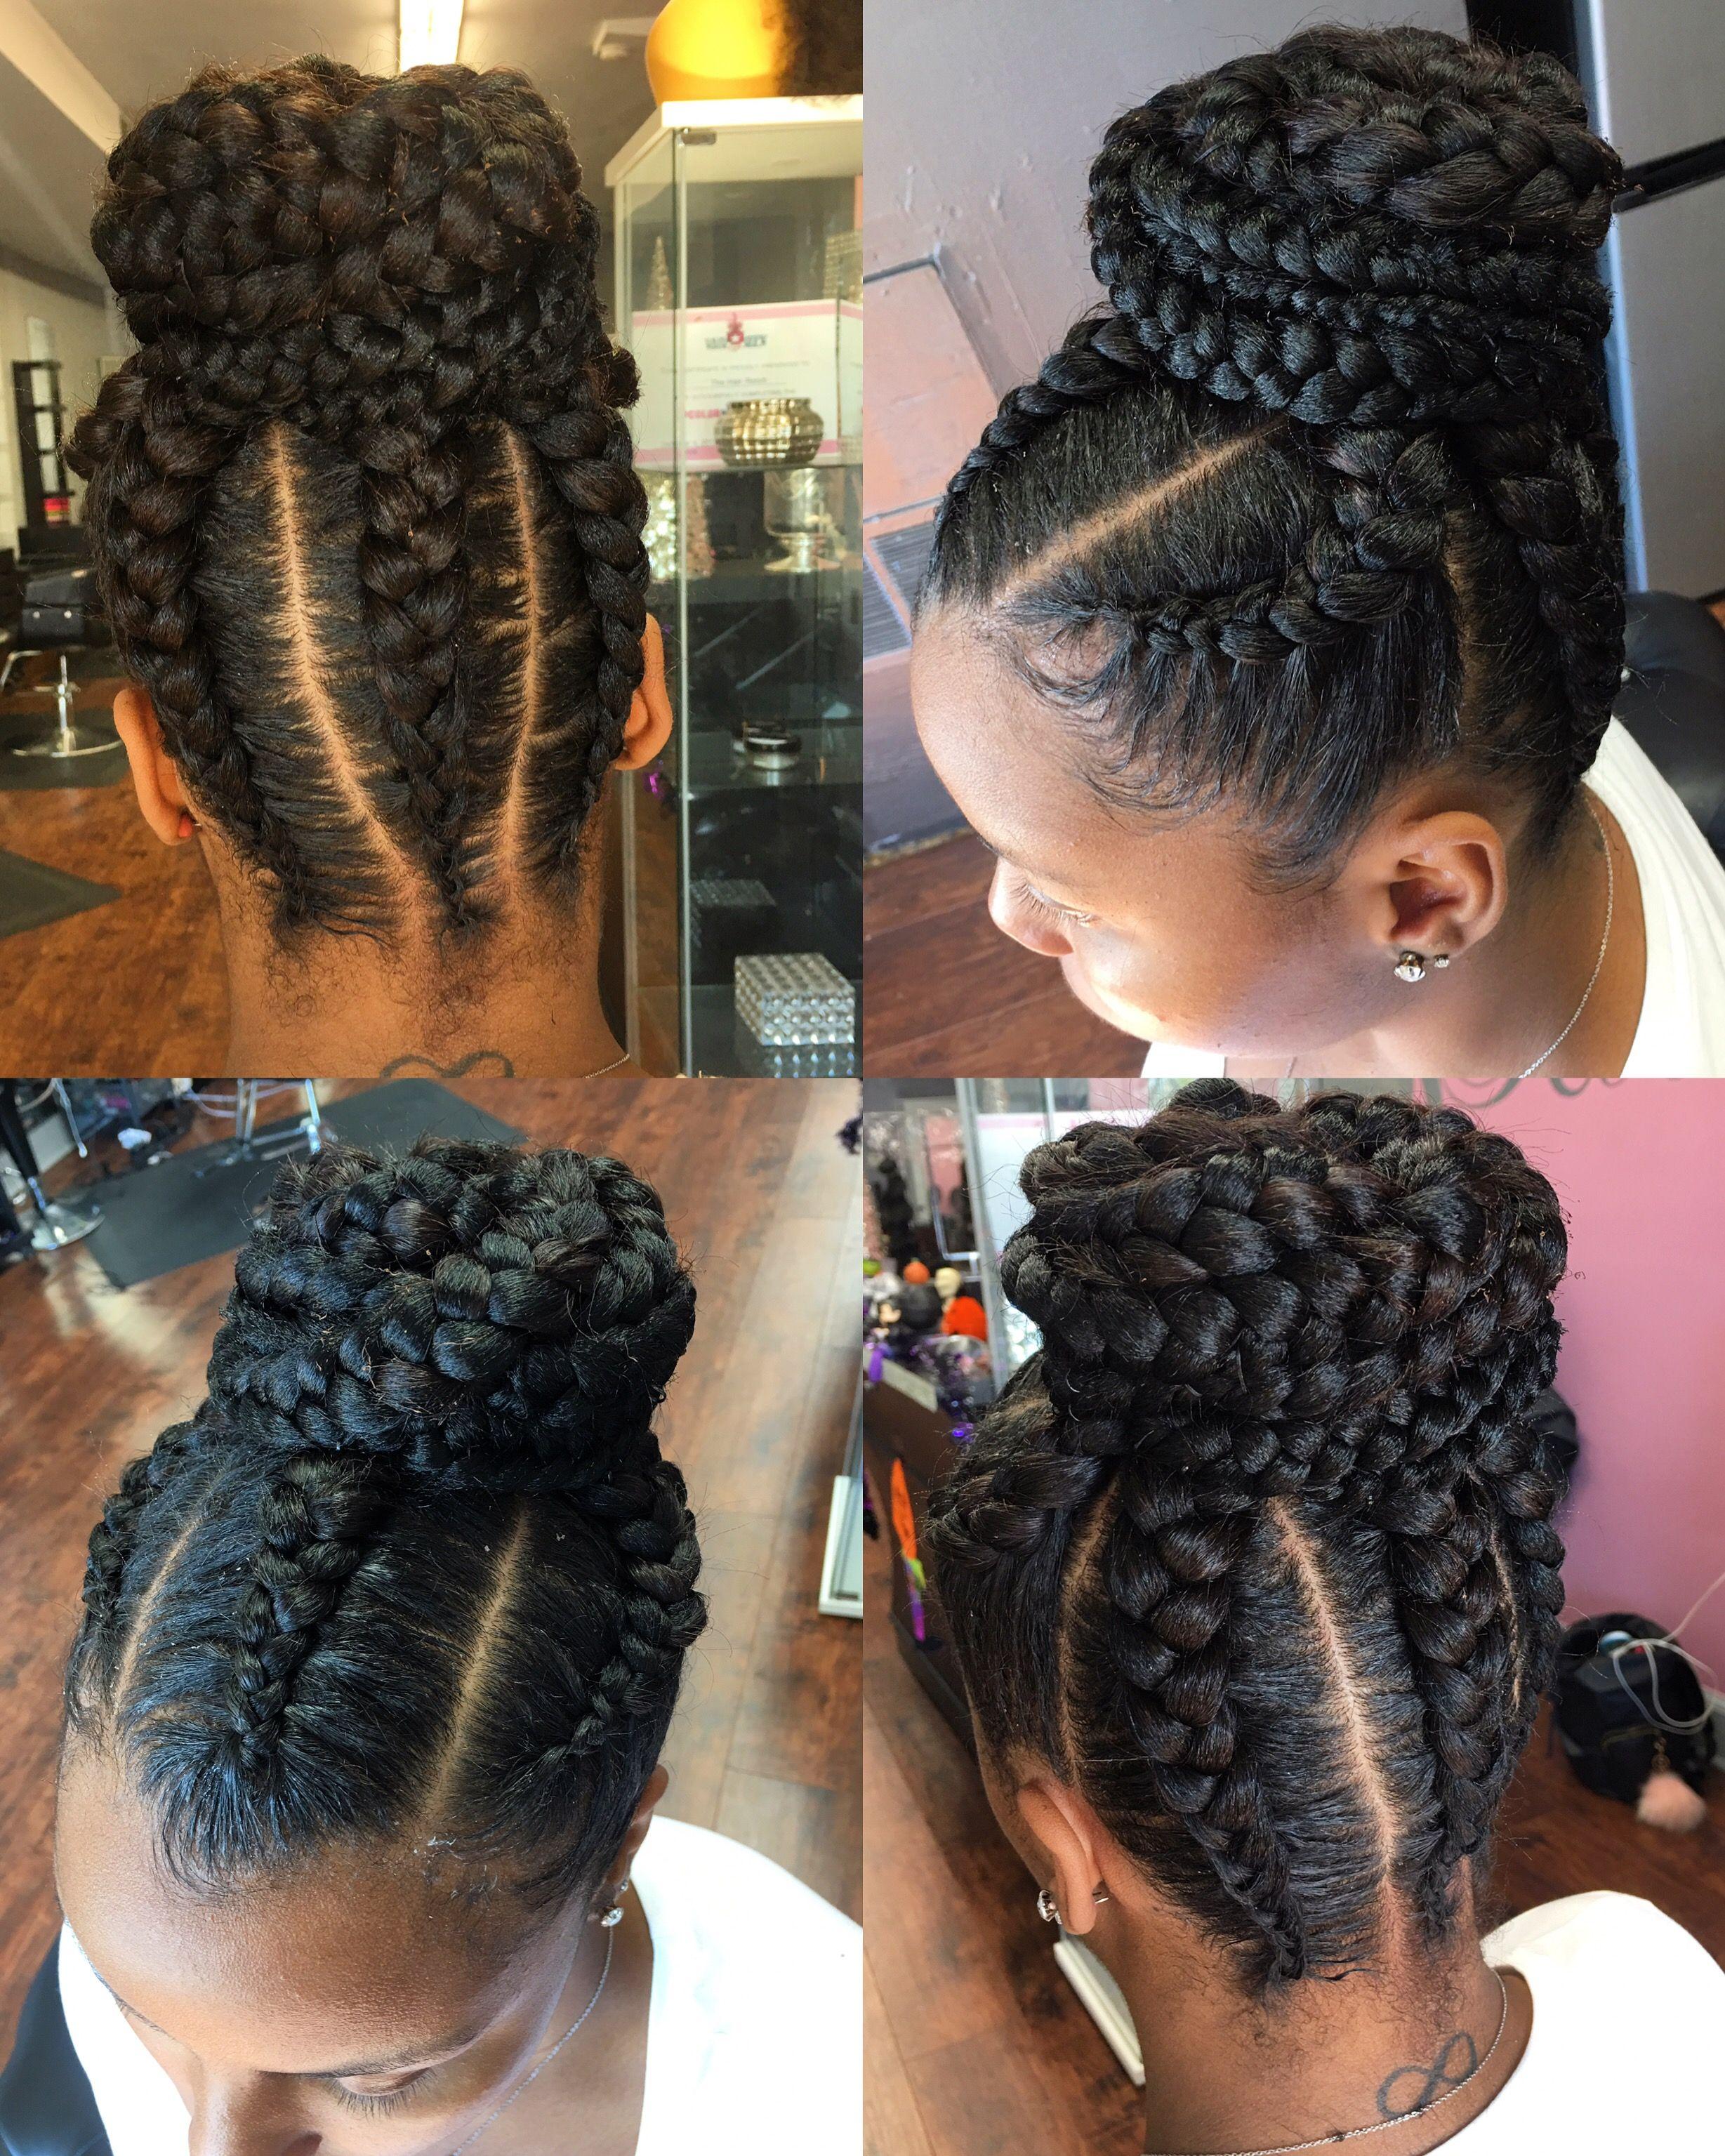 Goddess Braids Updo Hairstyles | Fade Haircut